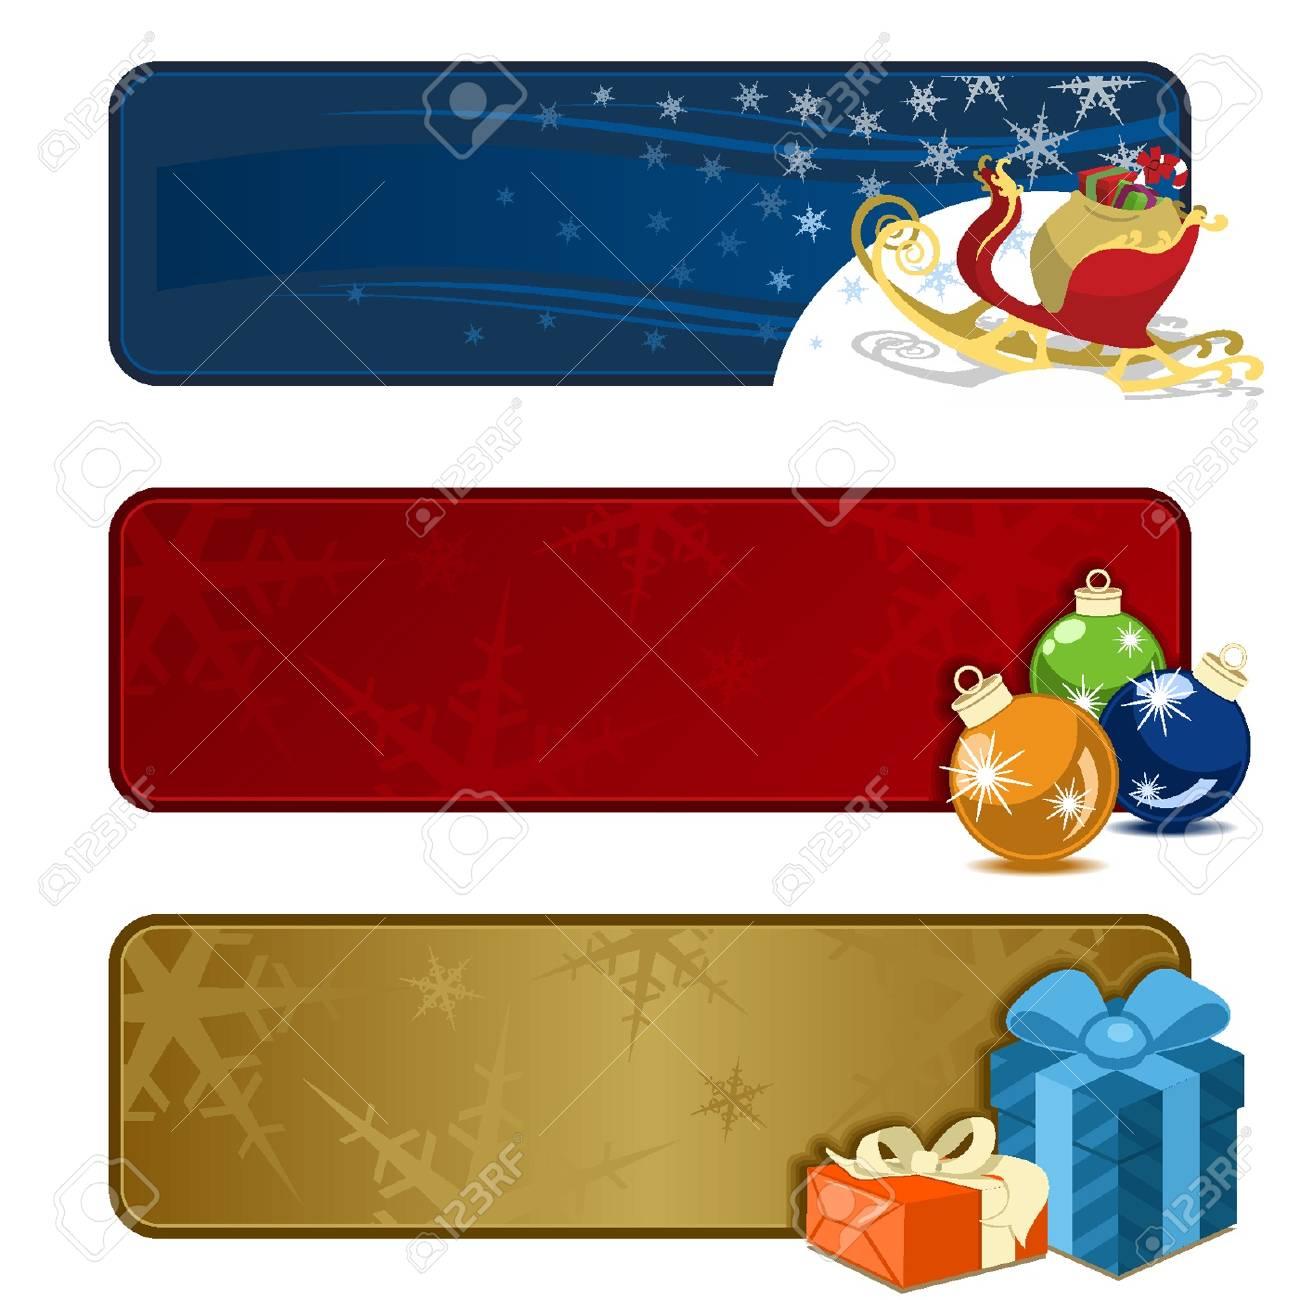 Christmas Wallpapers Stock Vector - 18134285